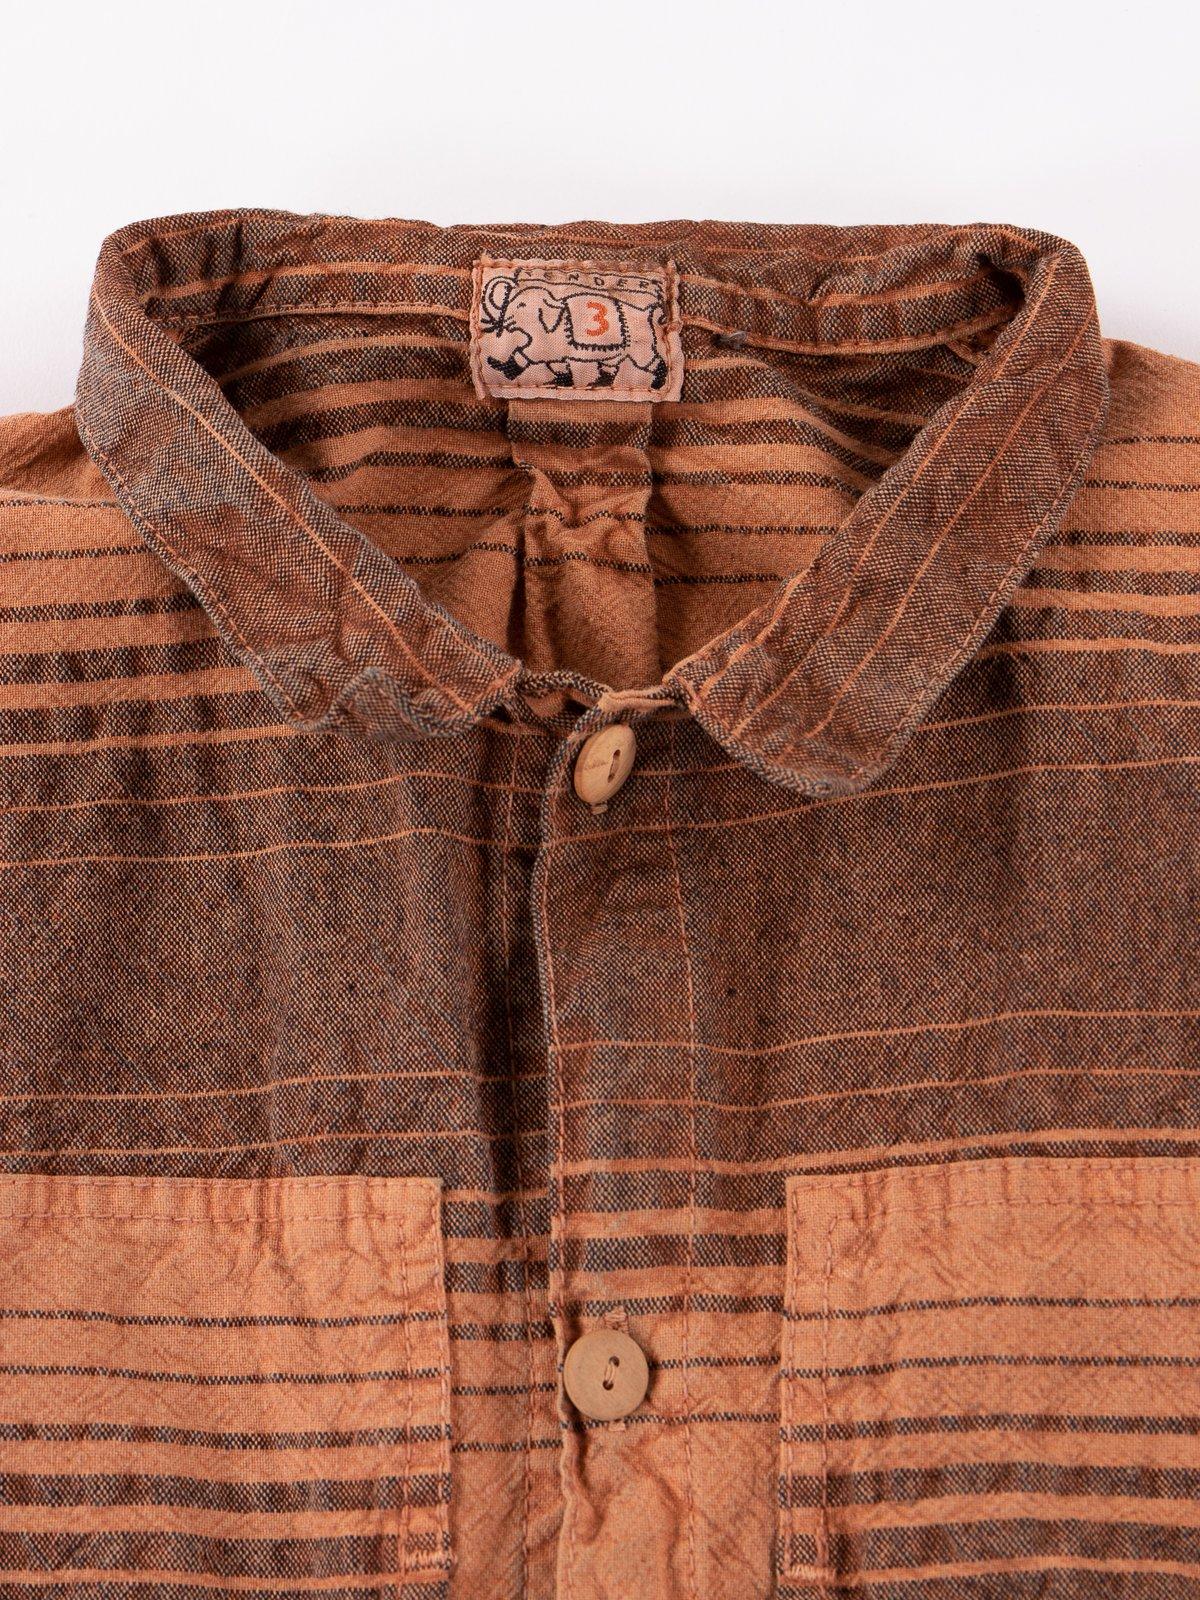 Red Ochre Dye Indigo Doppler Stripe Calico Periscope Pocket Tail Shirt - Image 4